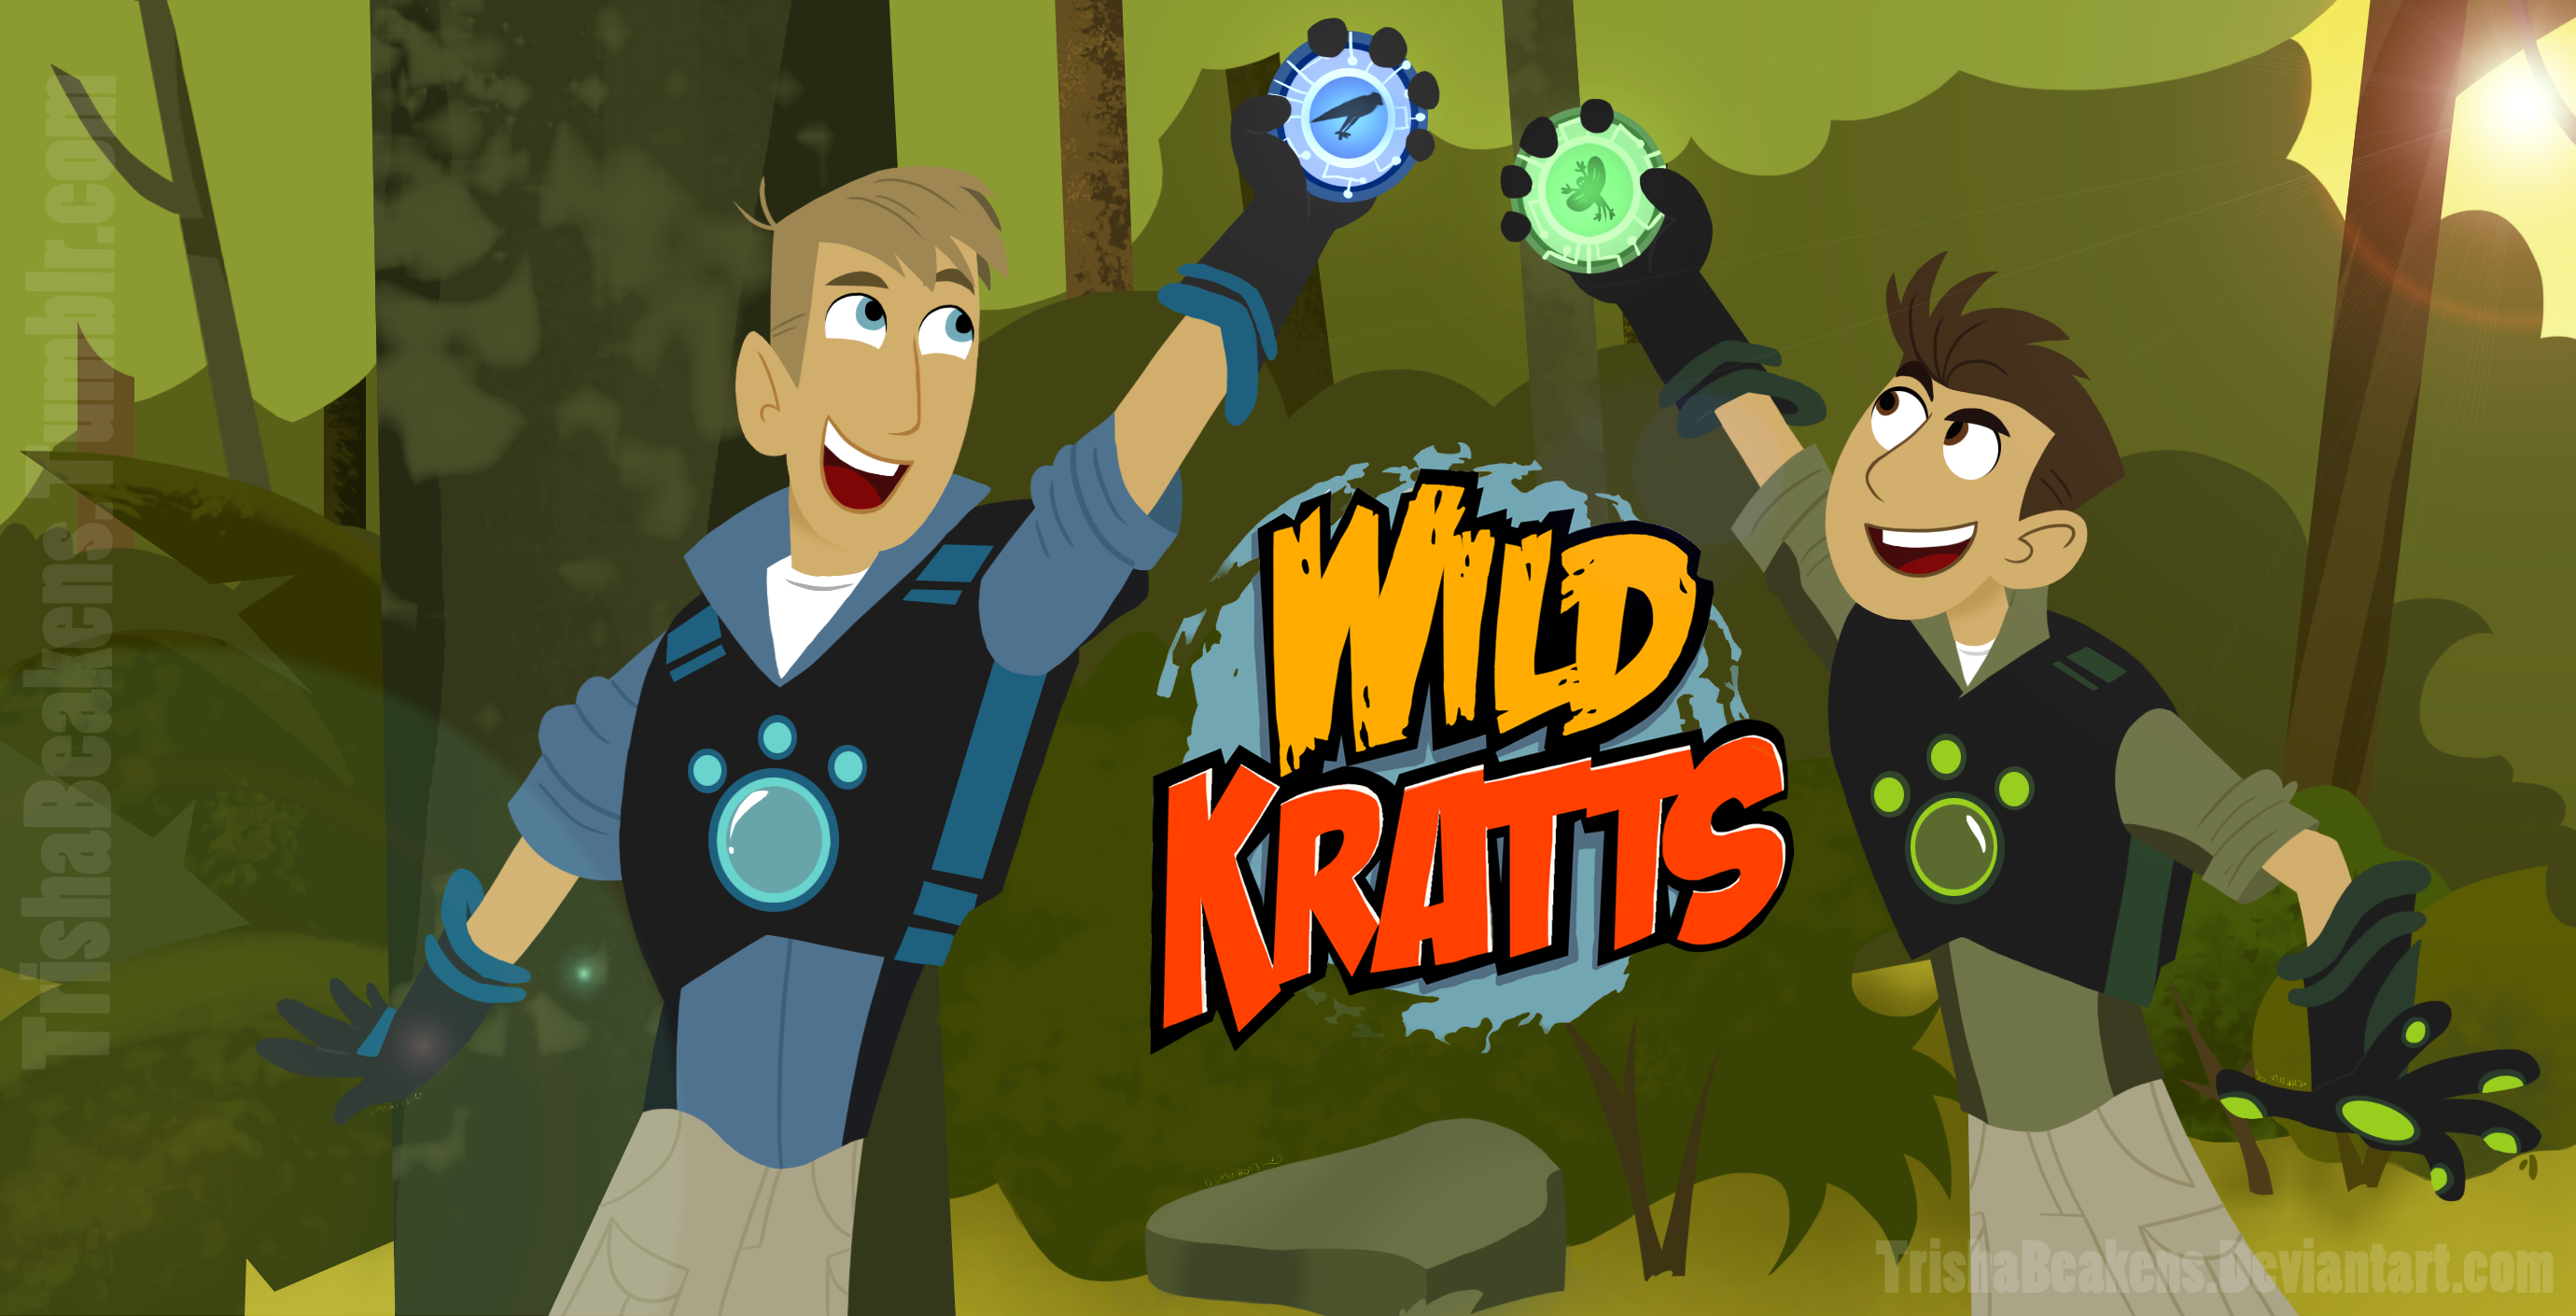 Wild Kratts Shirt Pic Only Wild Kratts Kid Movies Wild Kratts Birthday